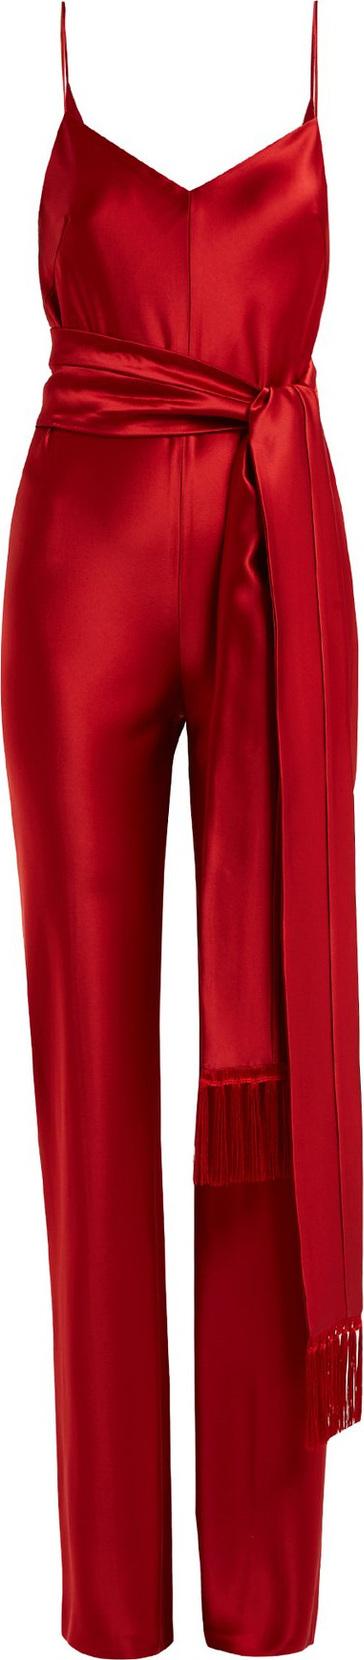 Galvan Cuzco tassel-embellished wide-leg satin jumpsuit